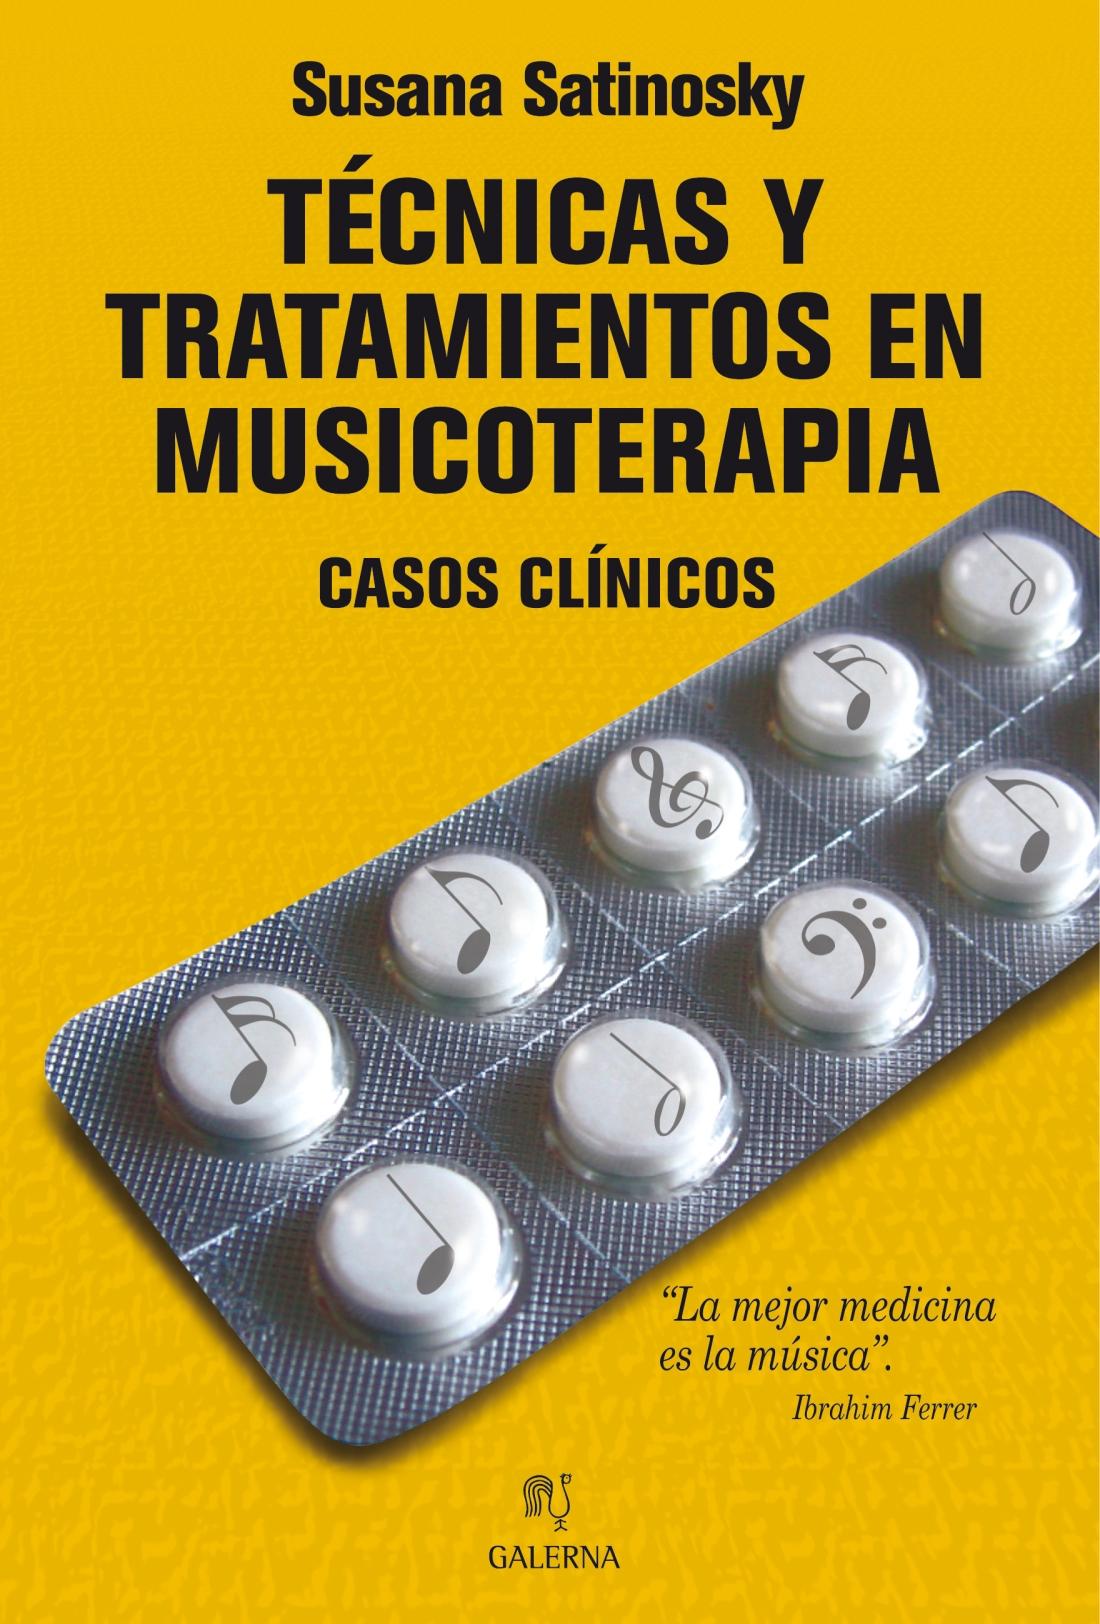 musicoterapia_02.jpg